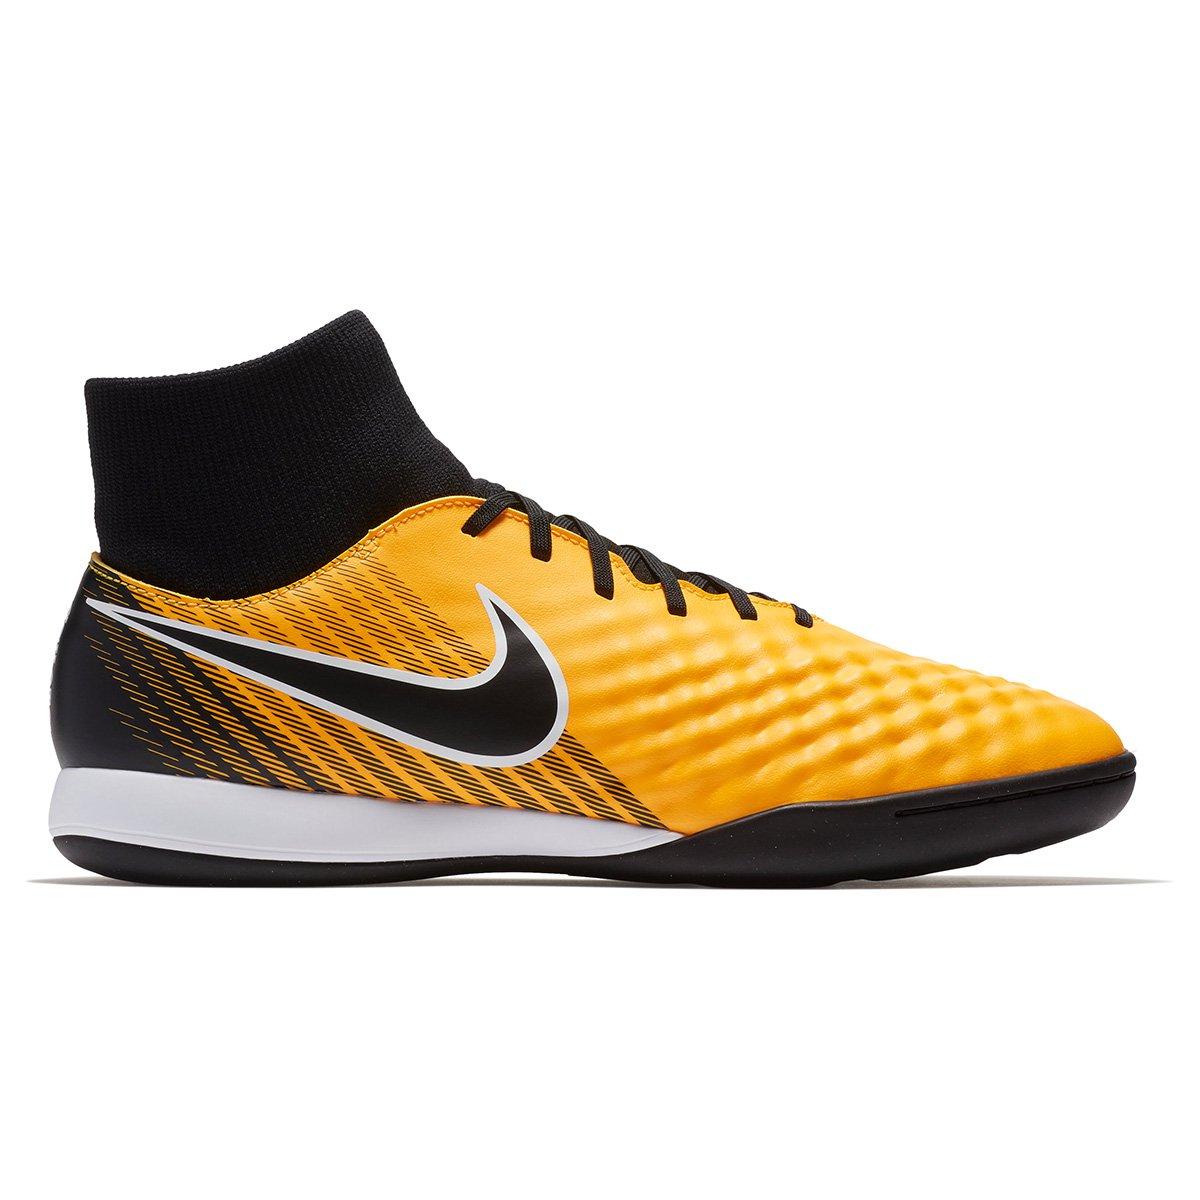 713c548d4db05 Chuteira Futsal Nike Magista Onda 2 DF IC - Compre Agora